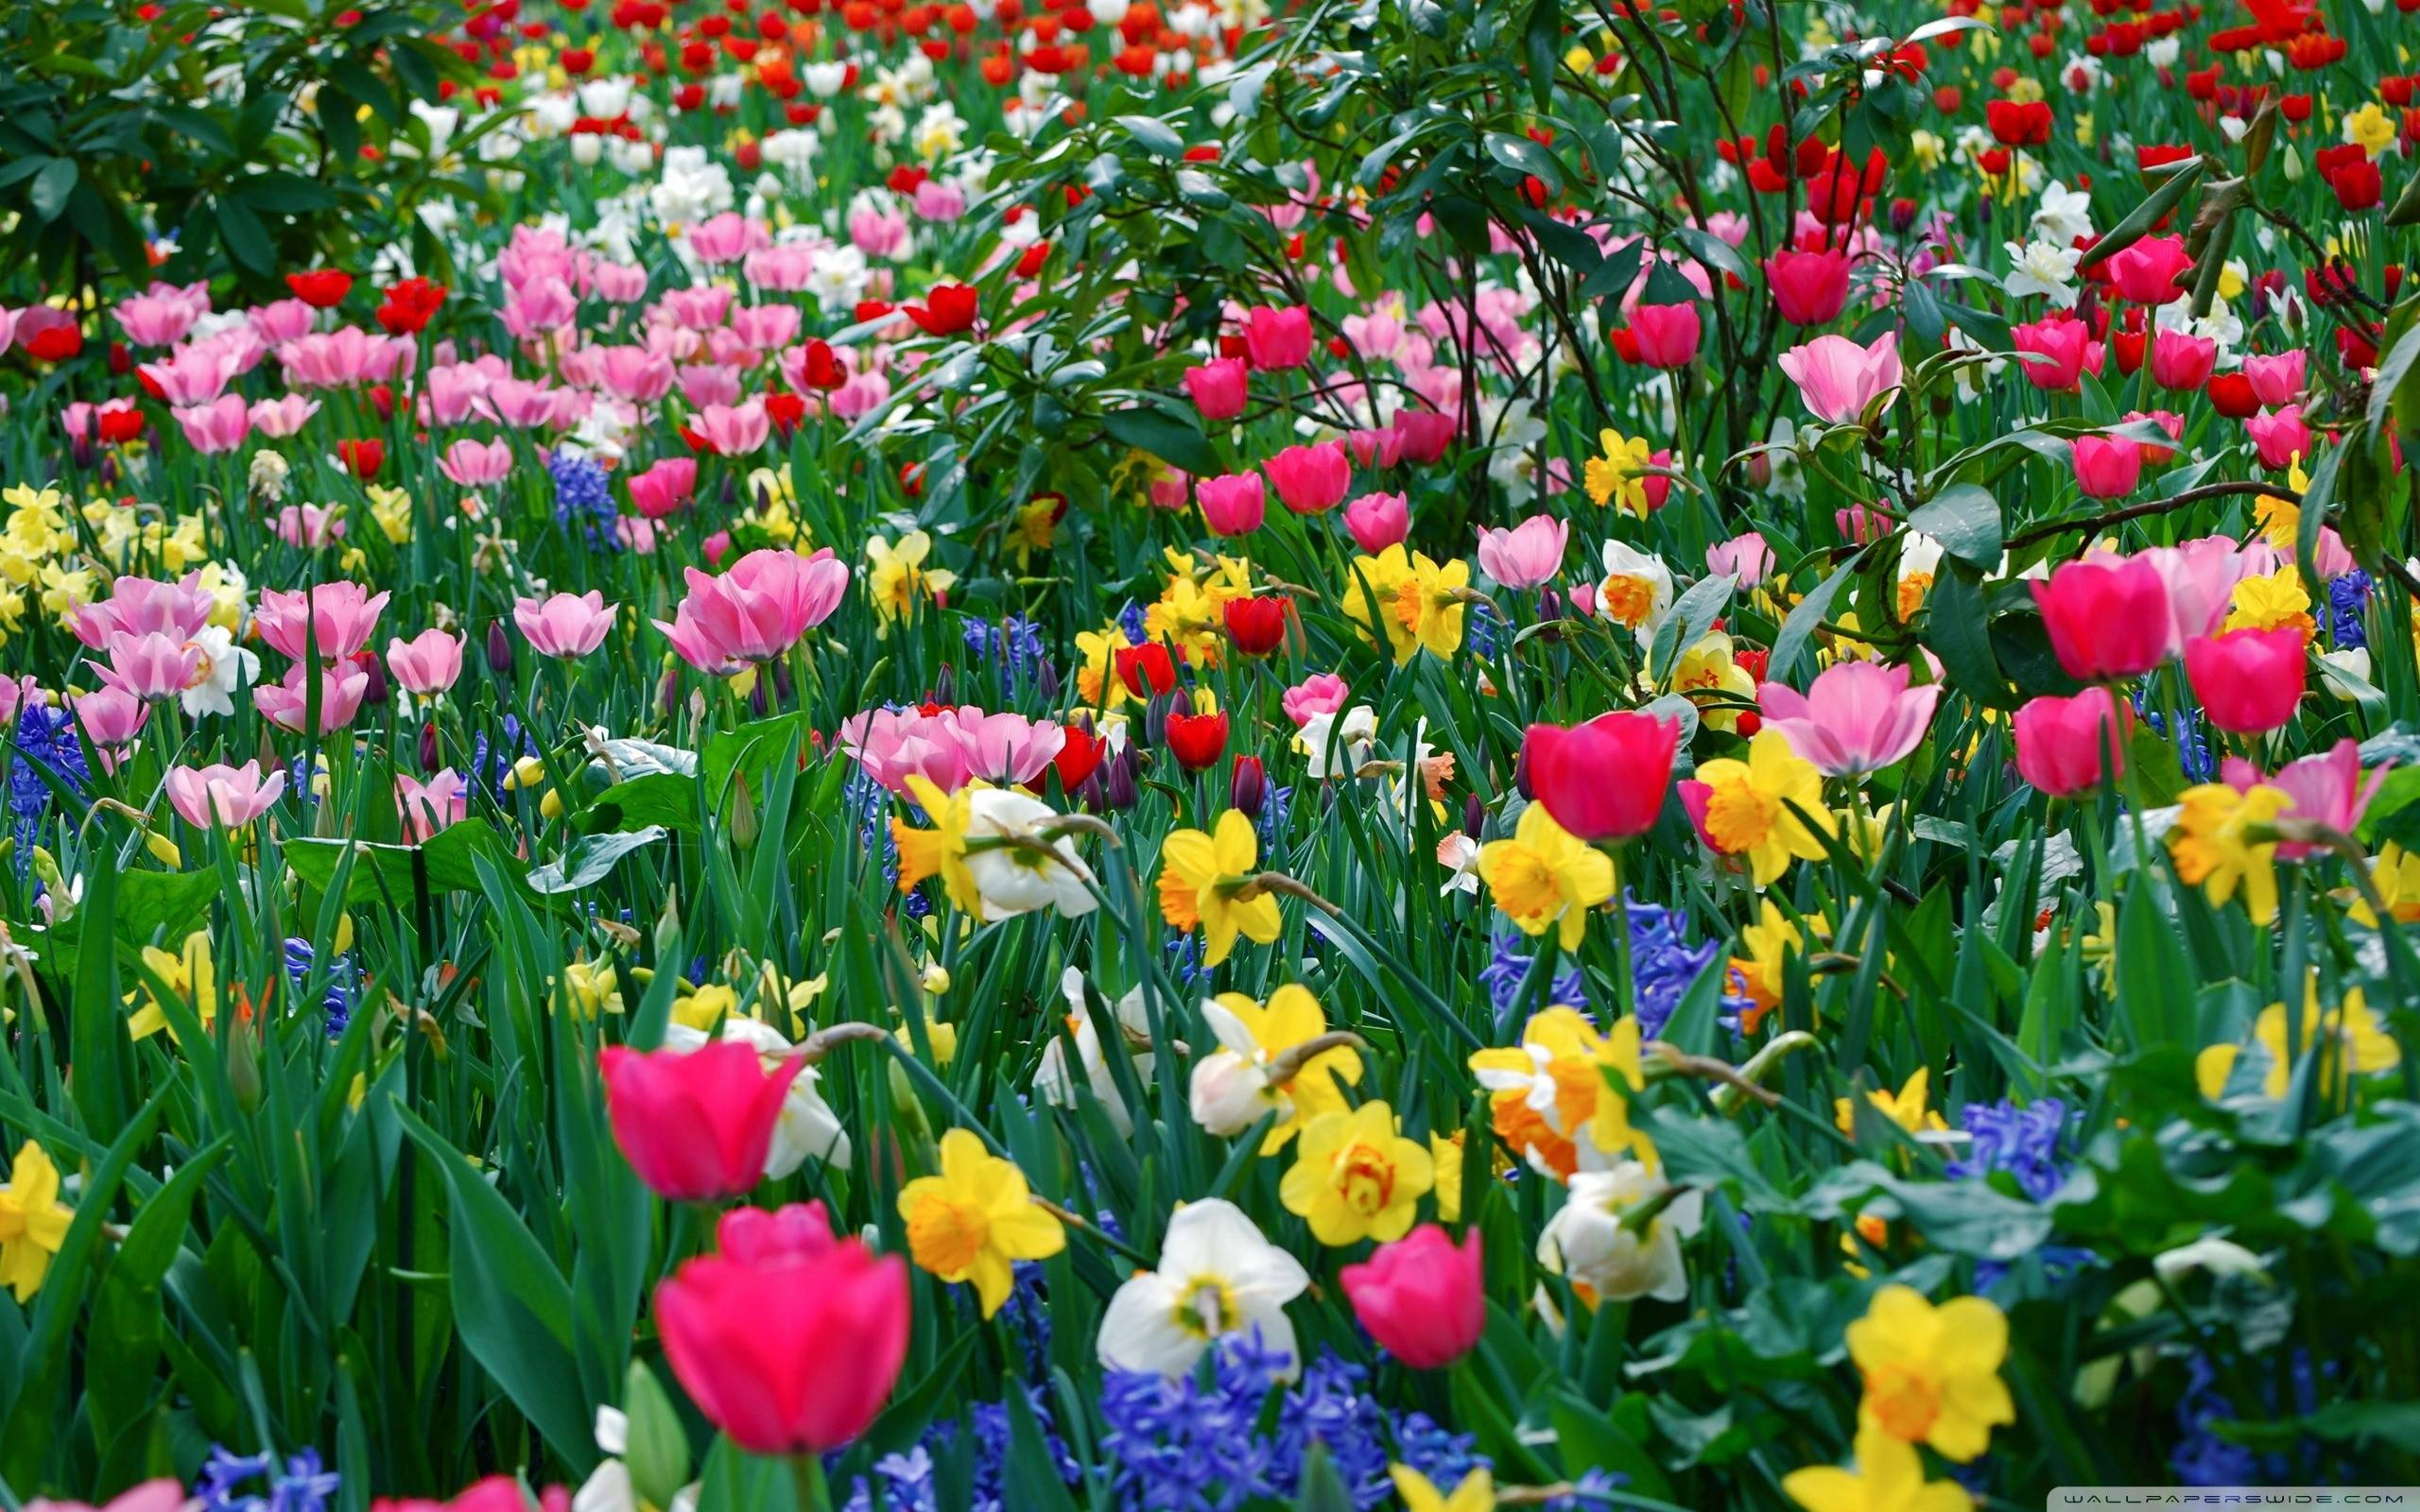 Spring Flowers Background Wallpaper Free Sitewallorg